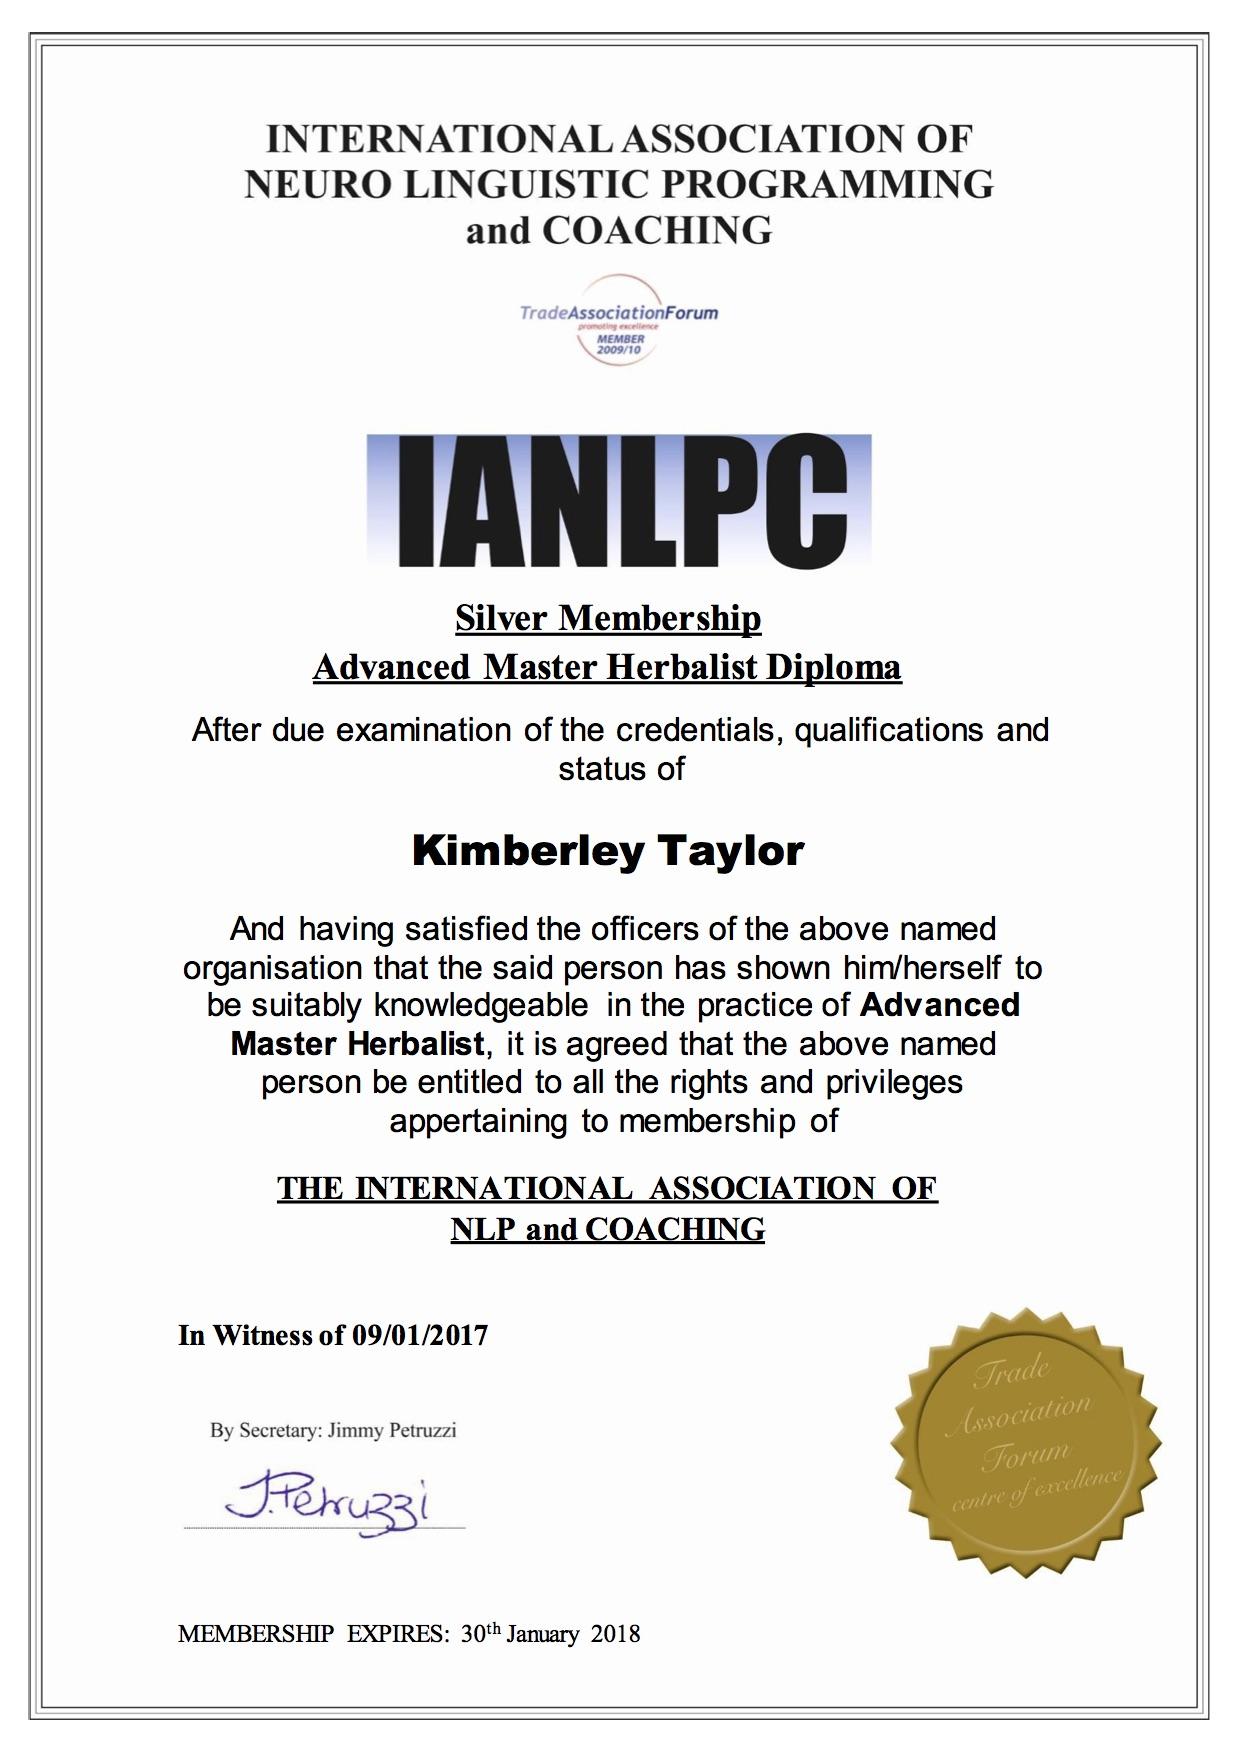 IANLPC Advanced Master Herbalist Diploma Kimberley Taylor